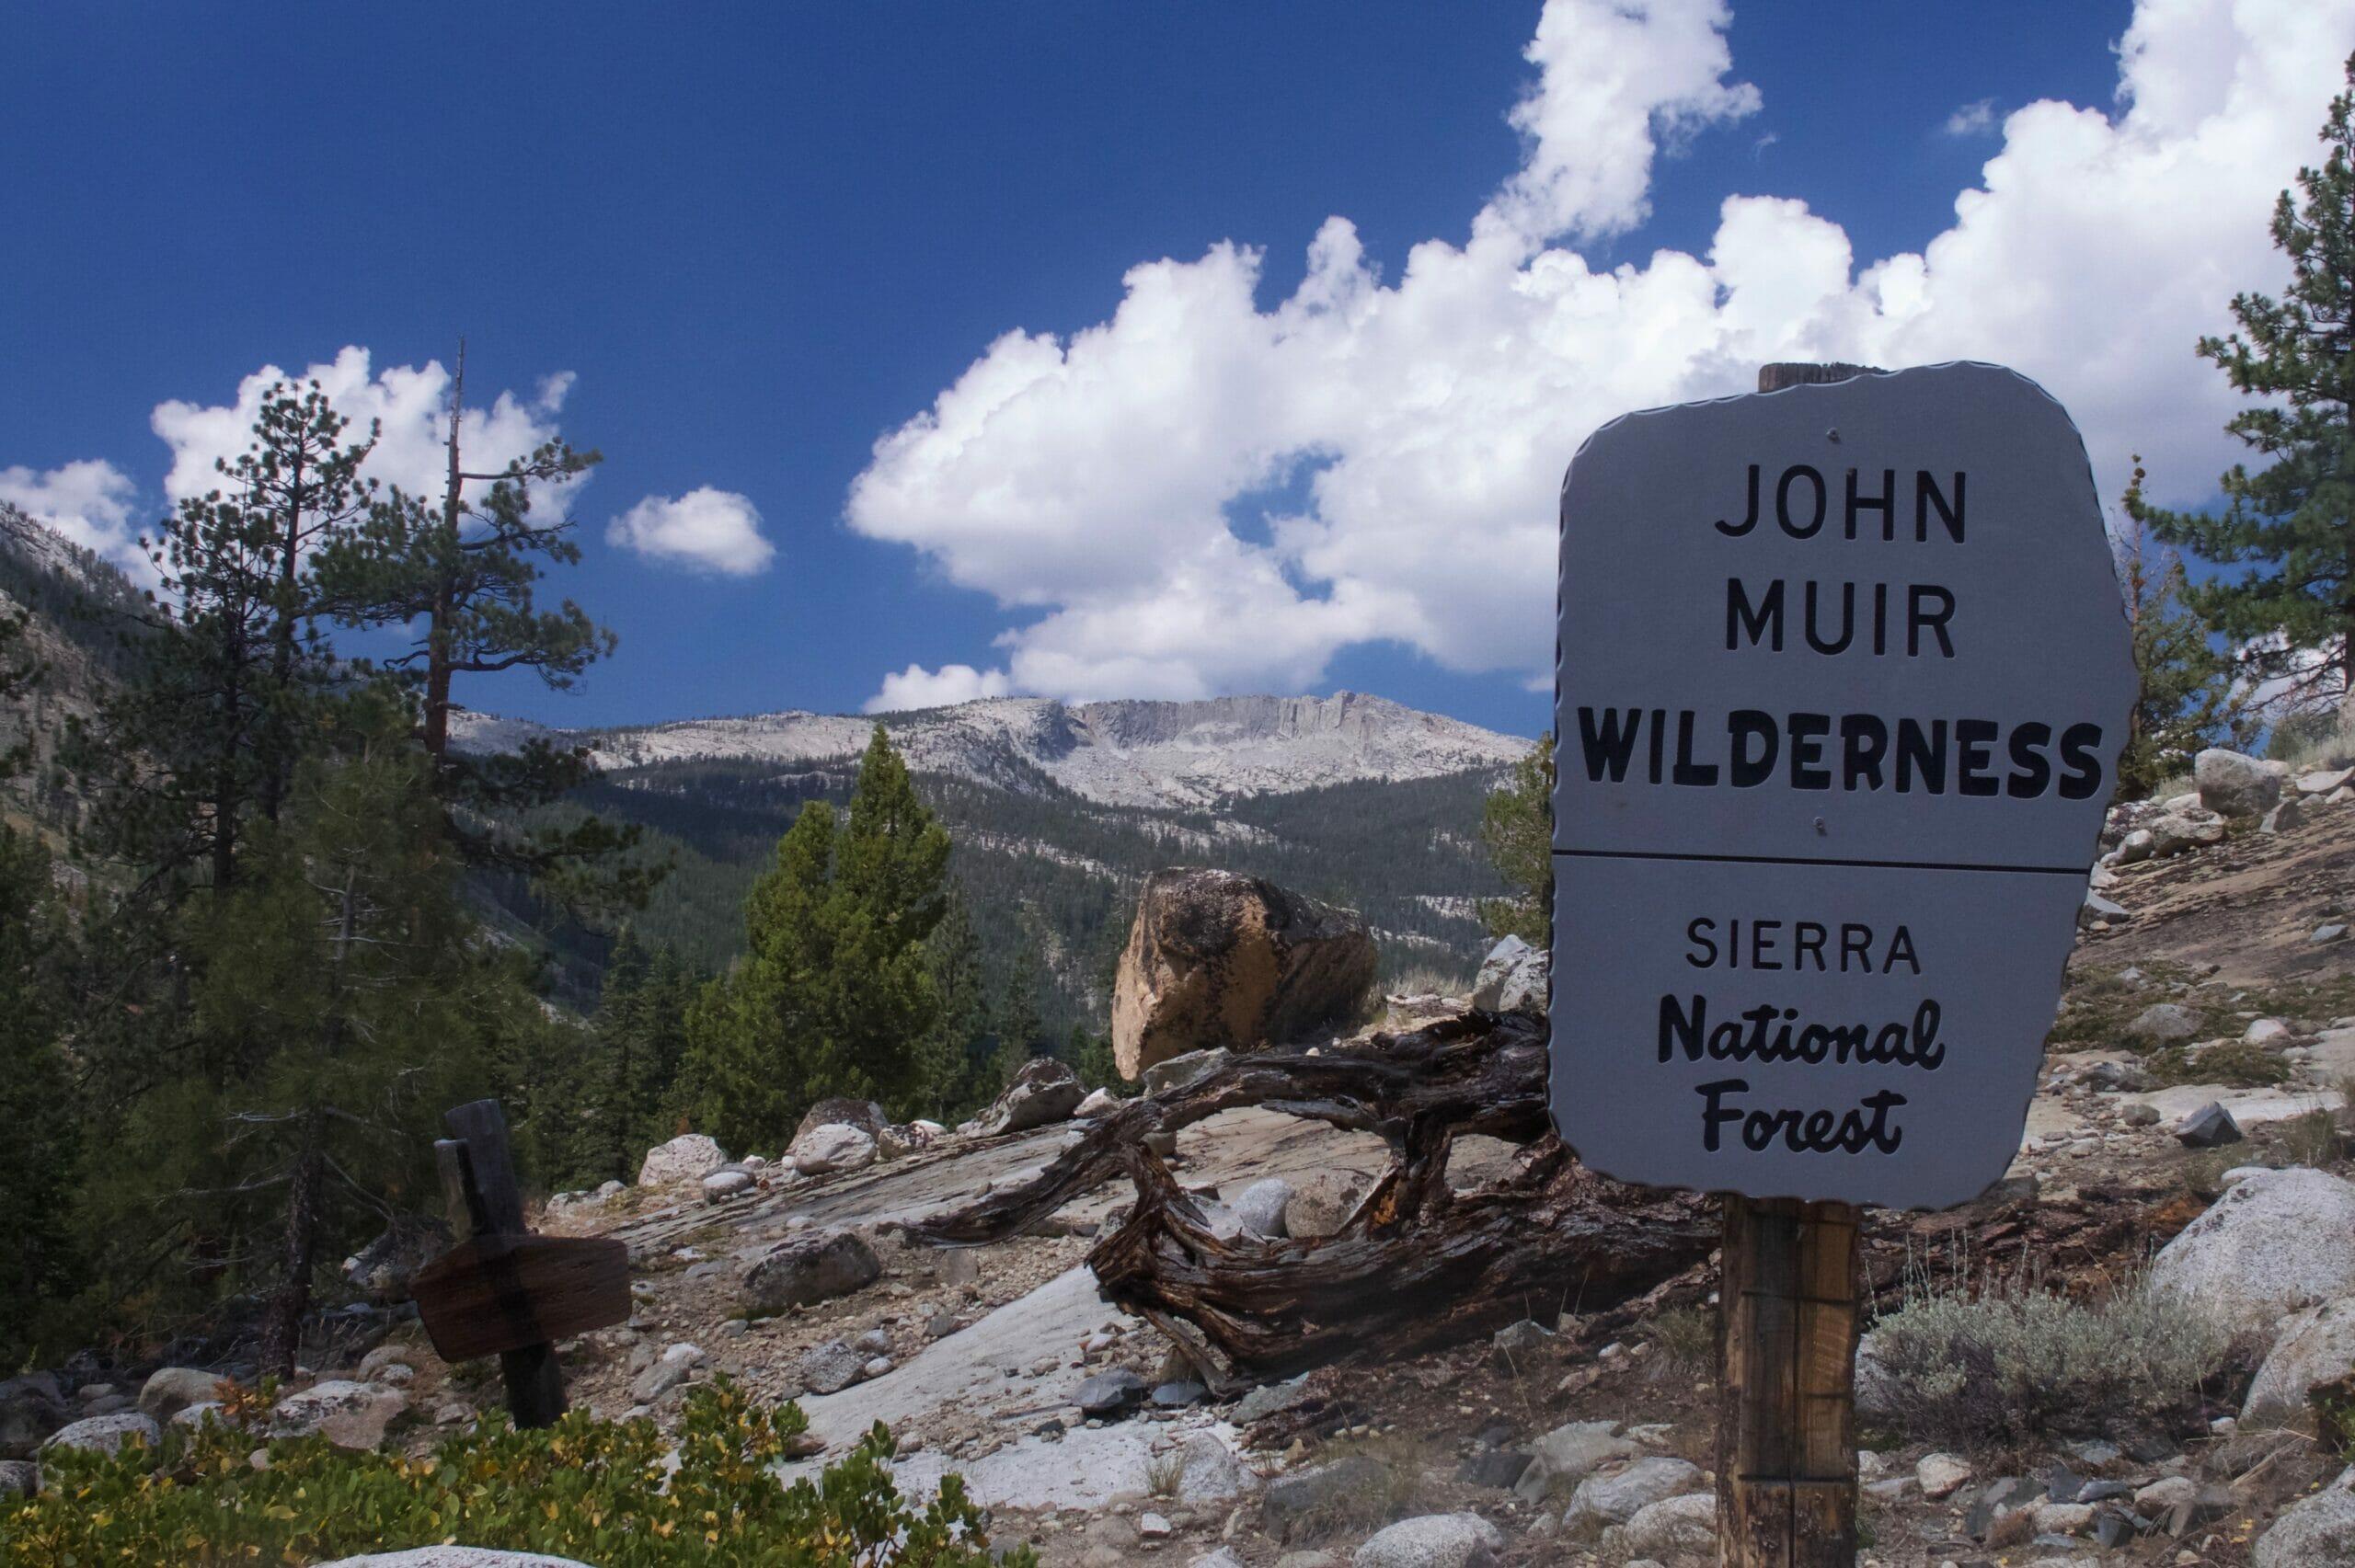 The John Muir Wilderness in California.